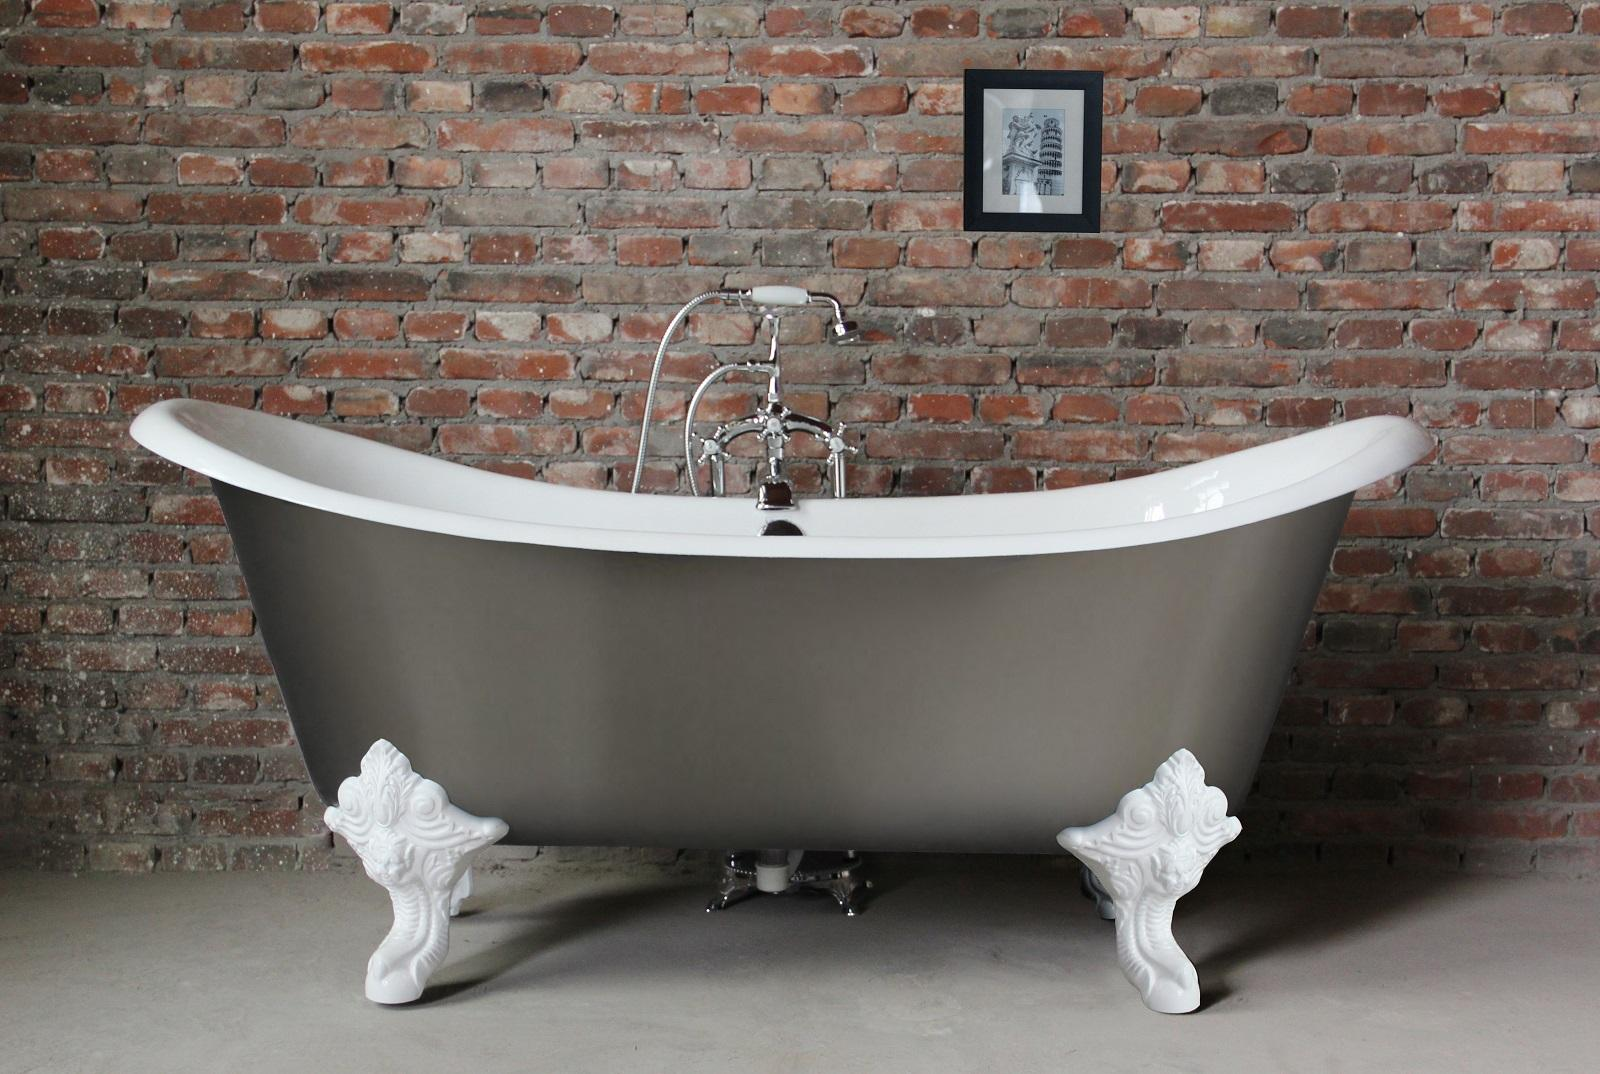 Vasca Da Bagno Piedini : Vasca da bagno di brockley con i piedini da windsor bathroom